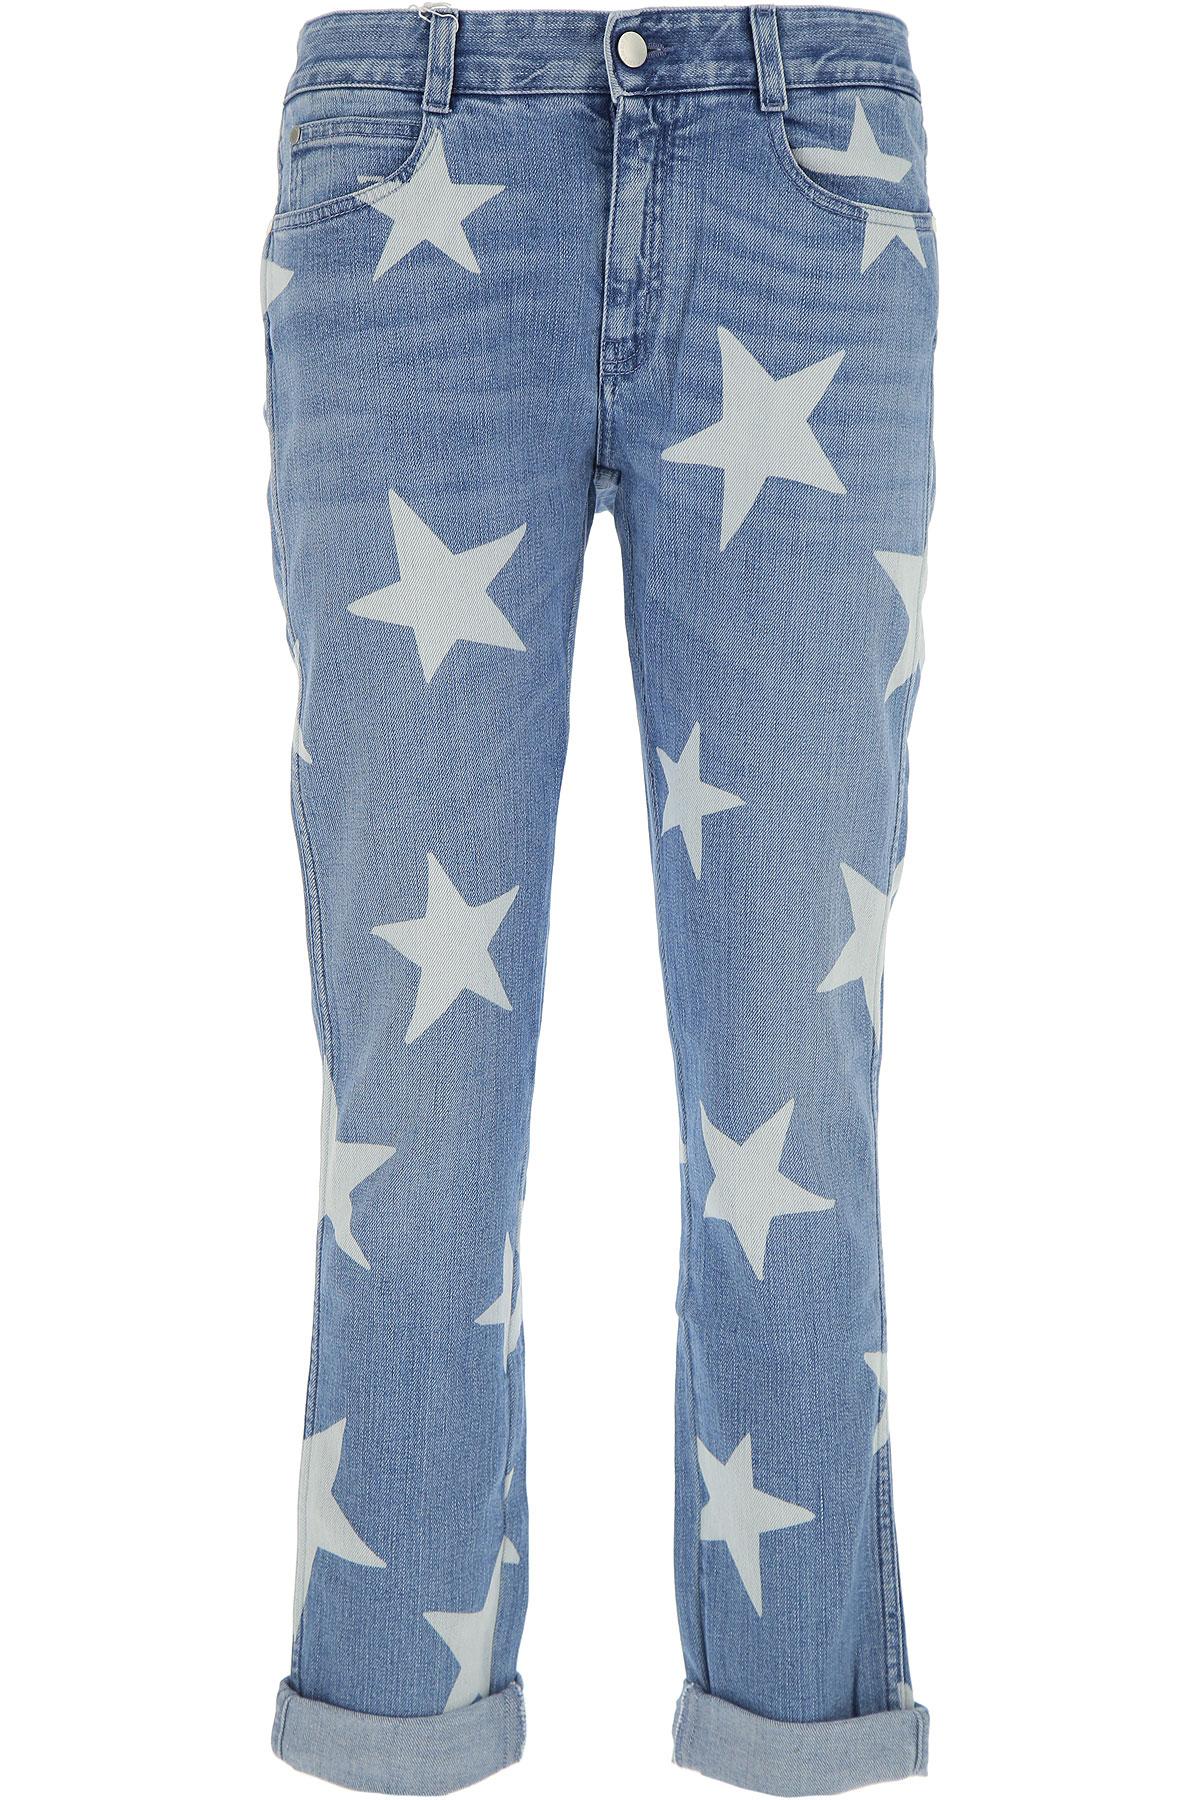 Stella McCartney Jeans, Denim Blue, Cotton, 2017, 25 26 27 28 29 USA-432025